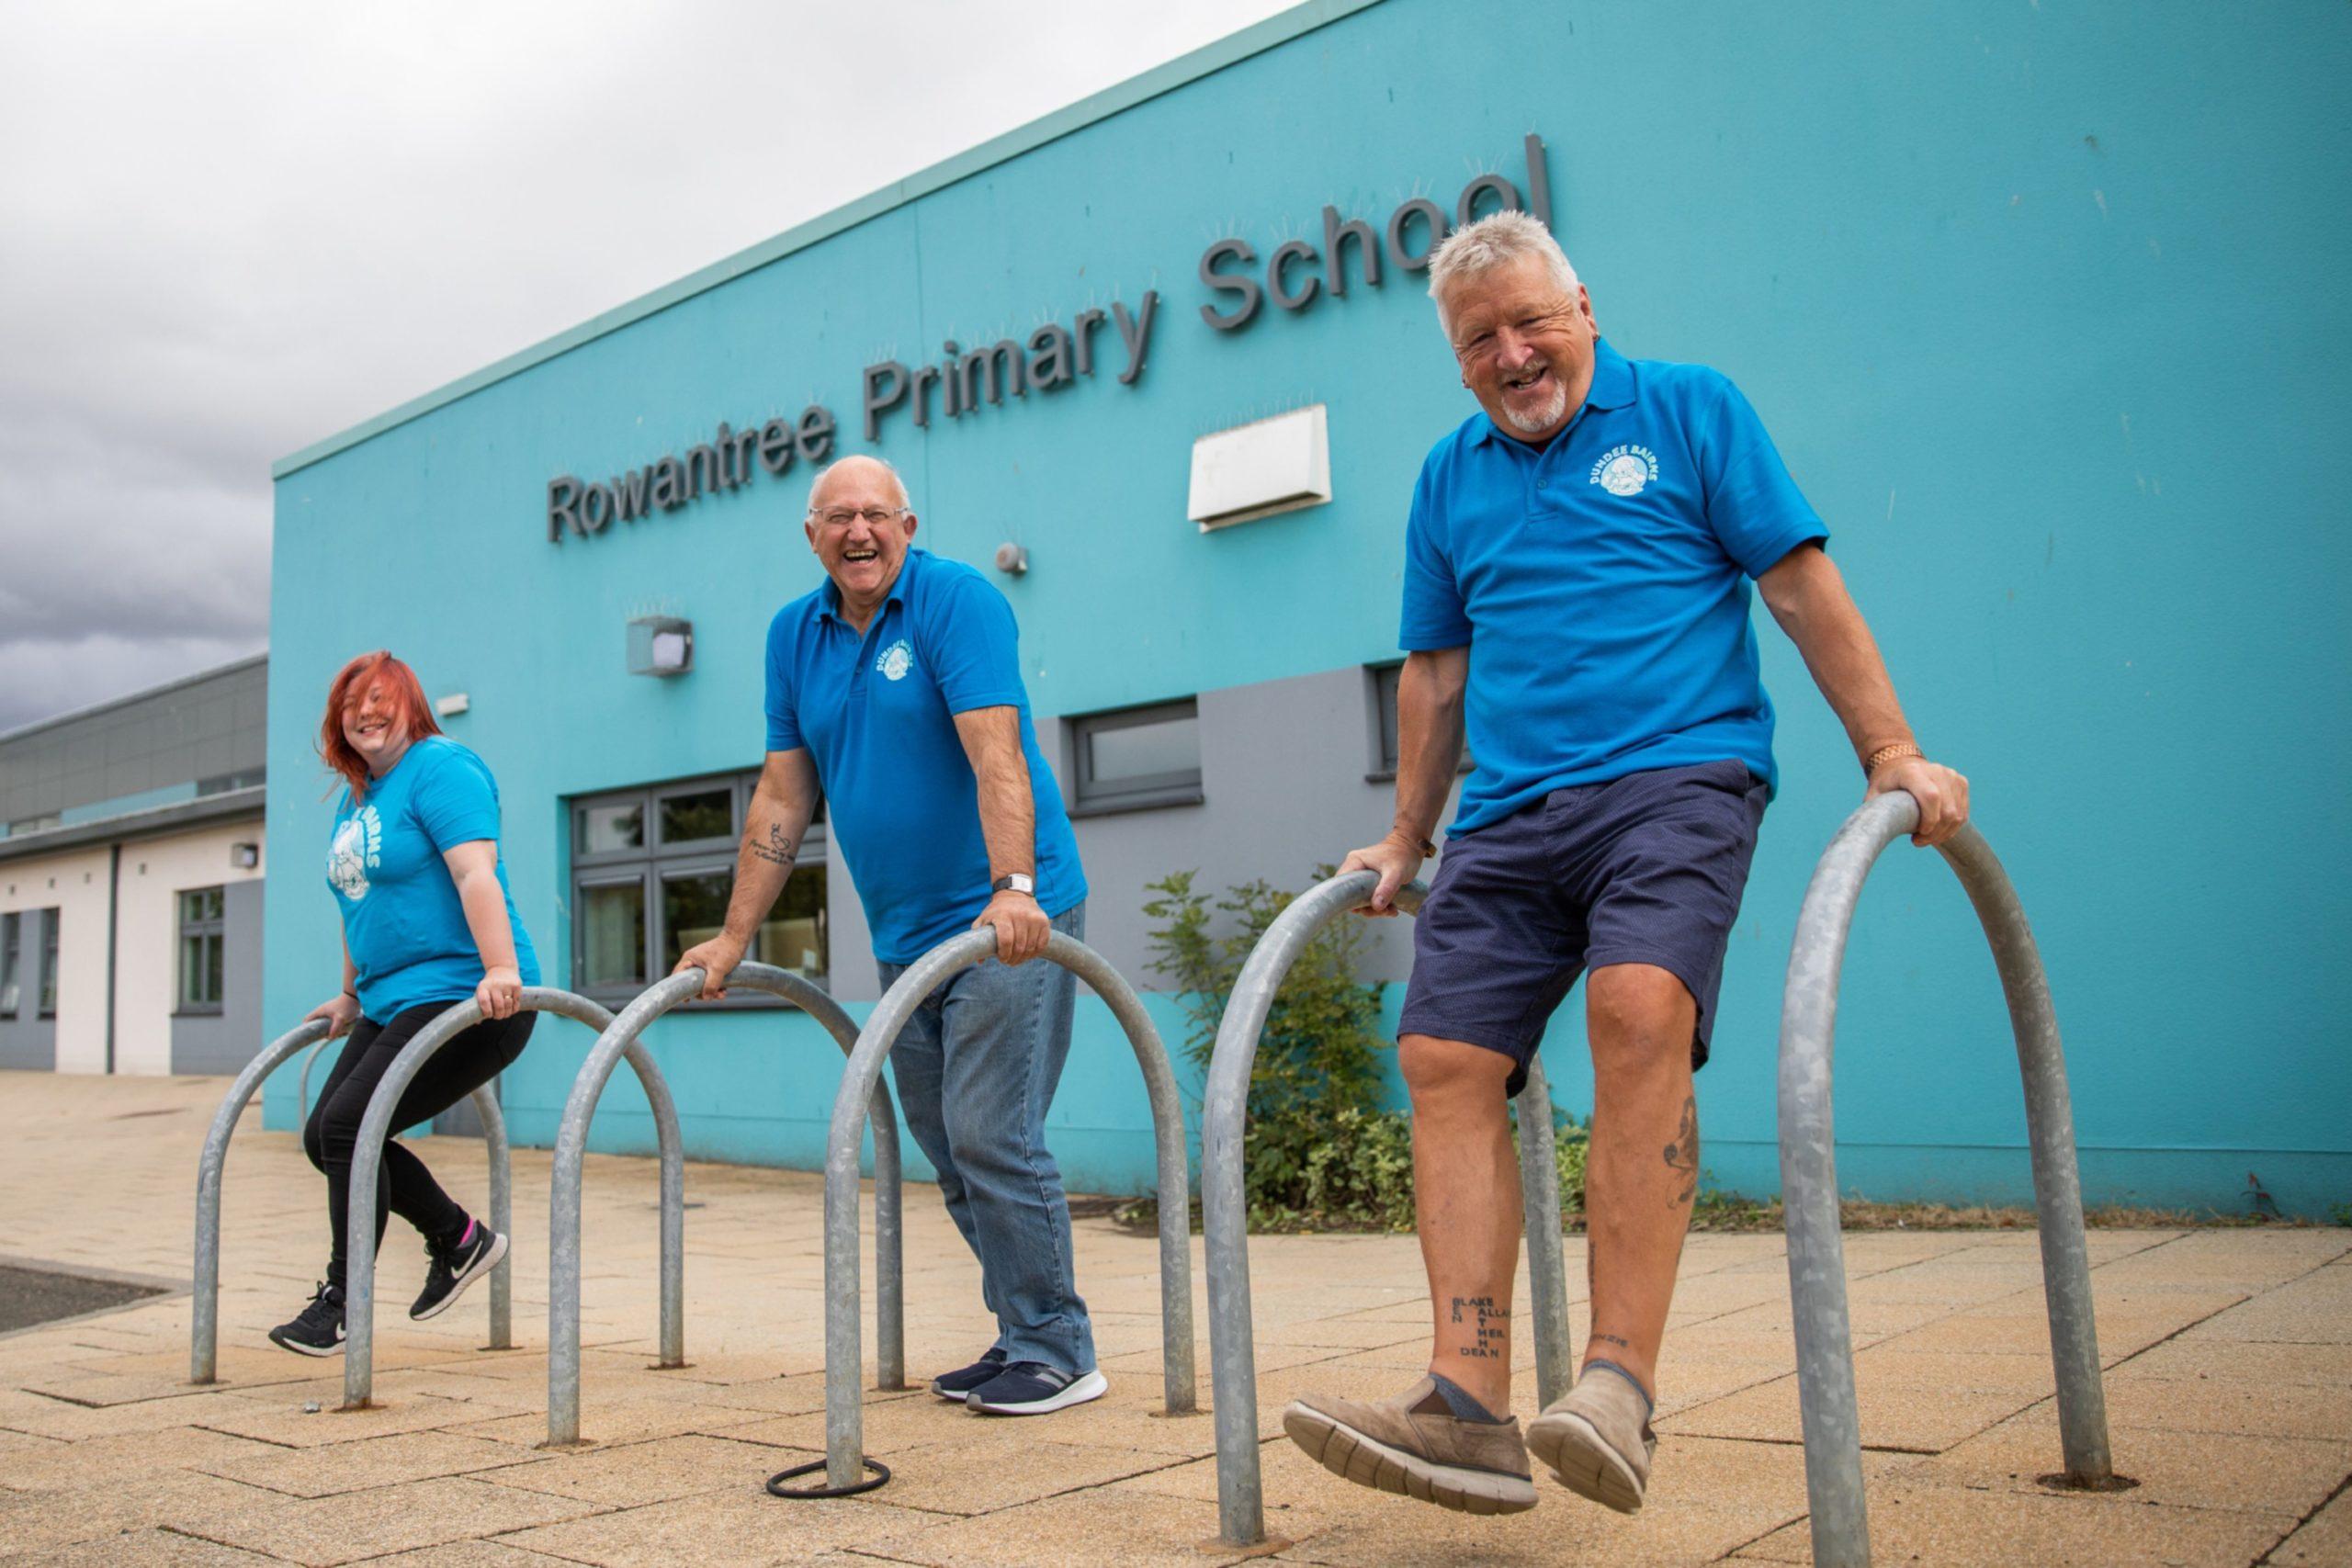 From left: coordinator Genna Millar, founder David Dorward and volunteer Ed Lawson, Rowantree Primary School.